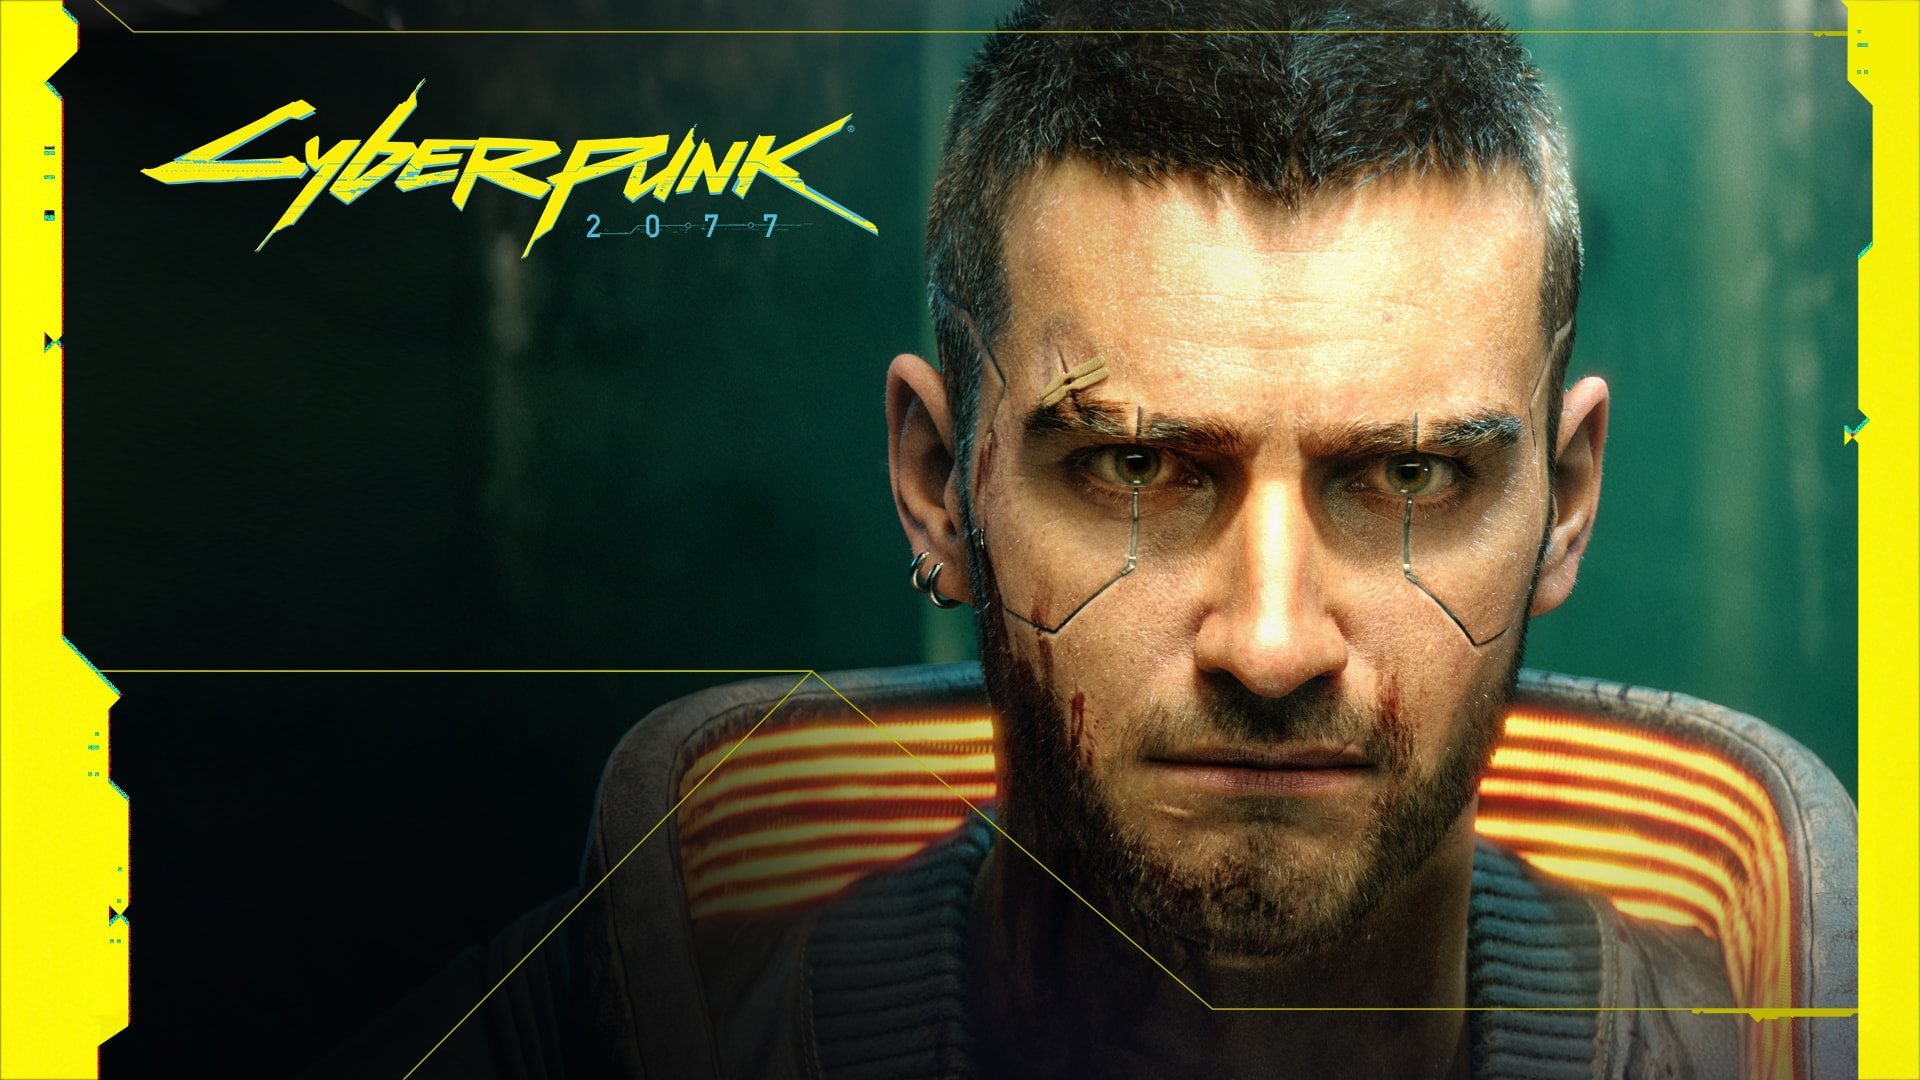 Gamescom 2019; screenshot: Cyberpunk 2077